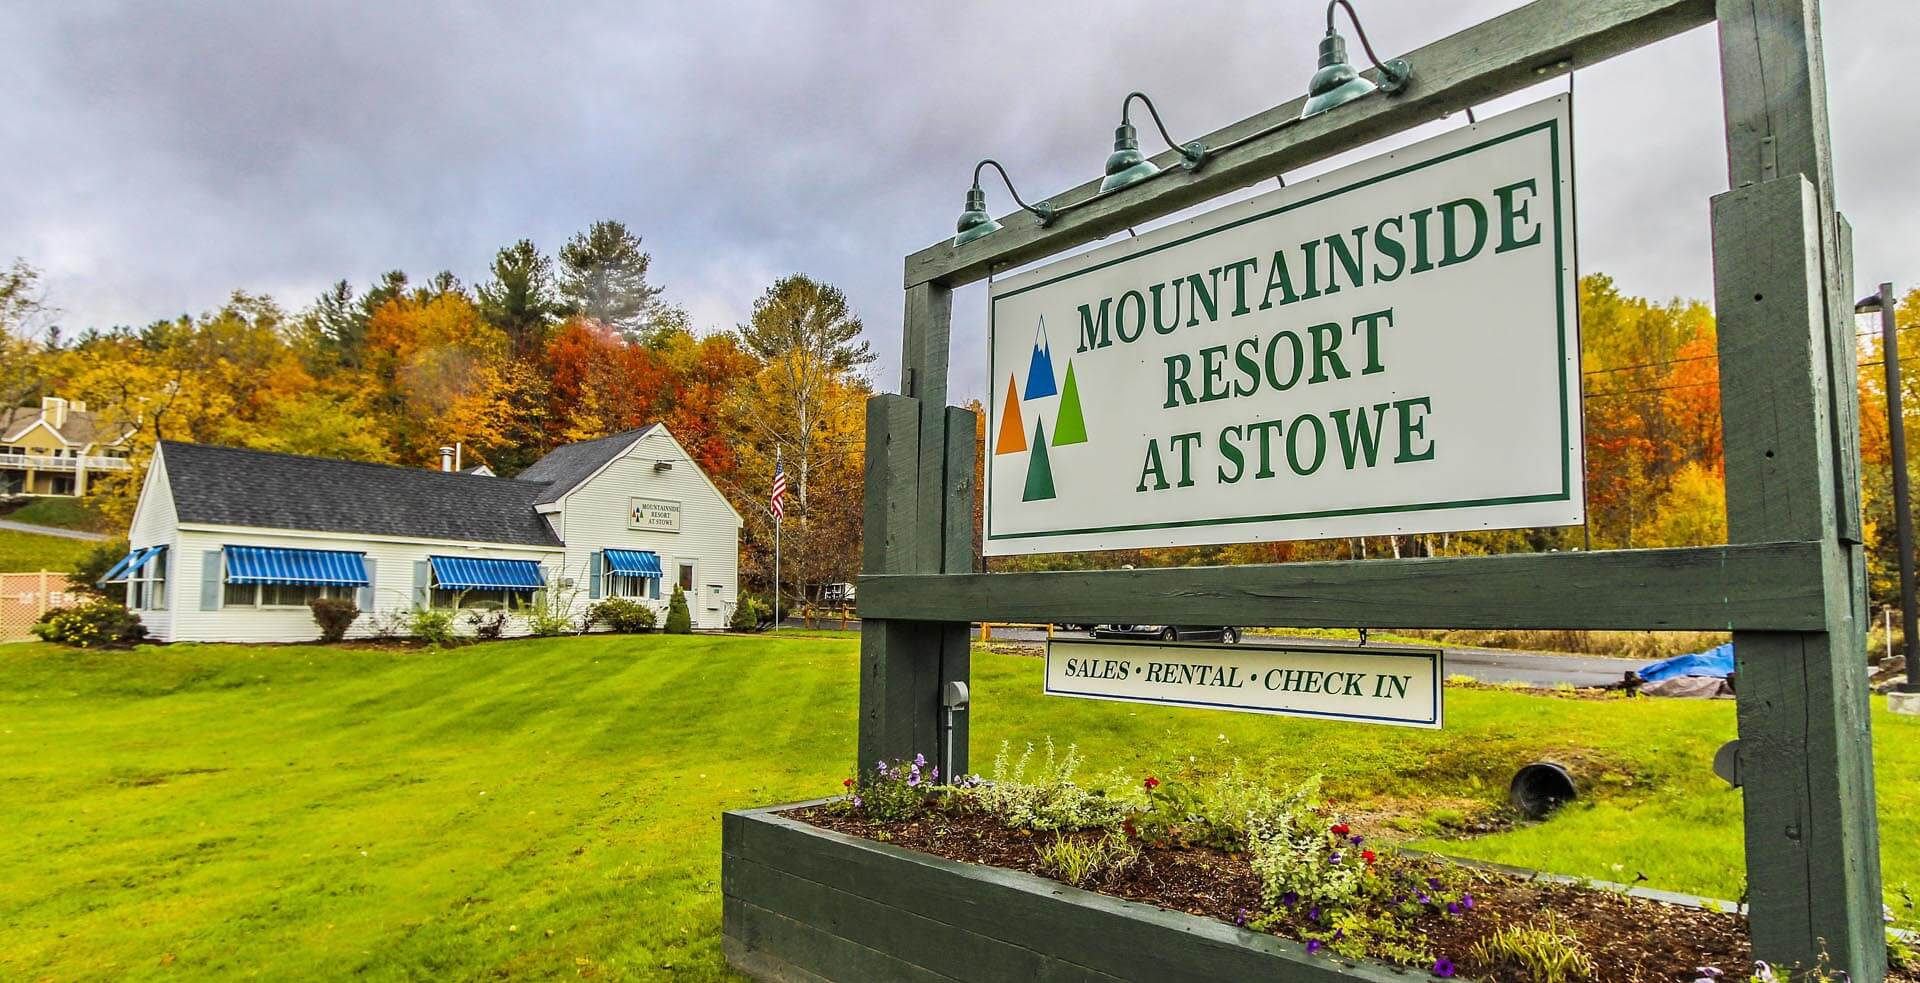 Mountainside Resort At Stowe Signage